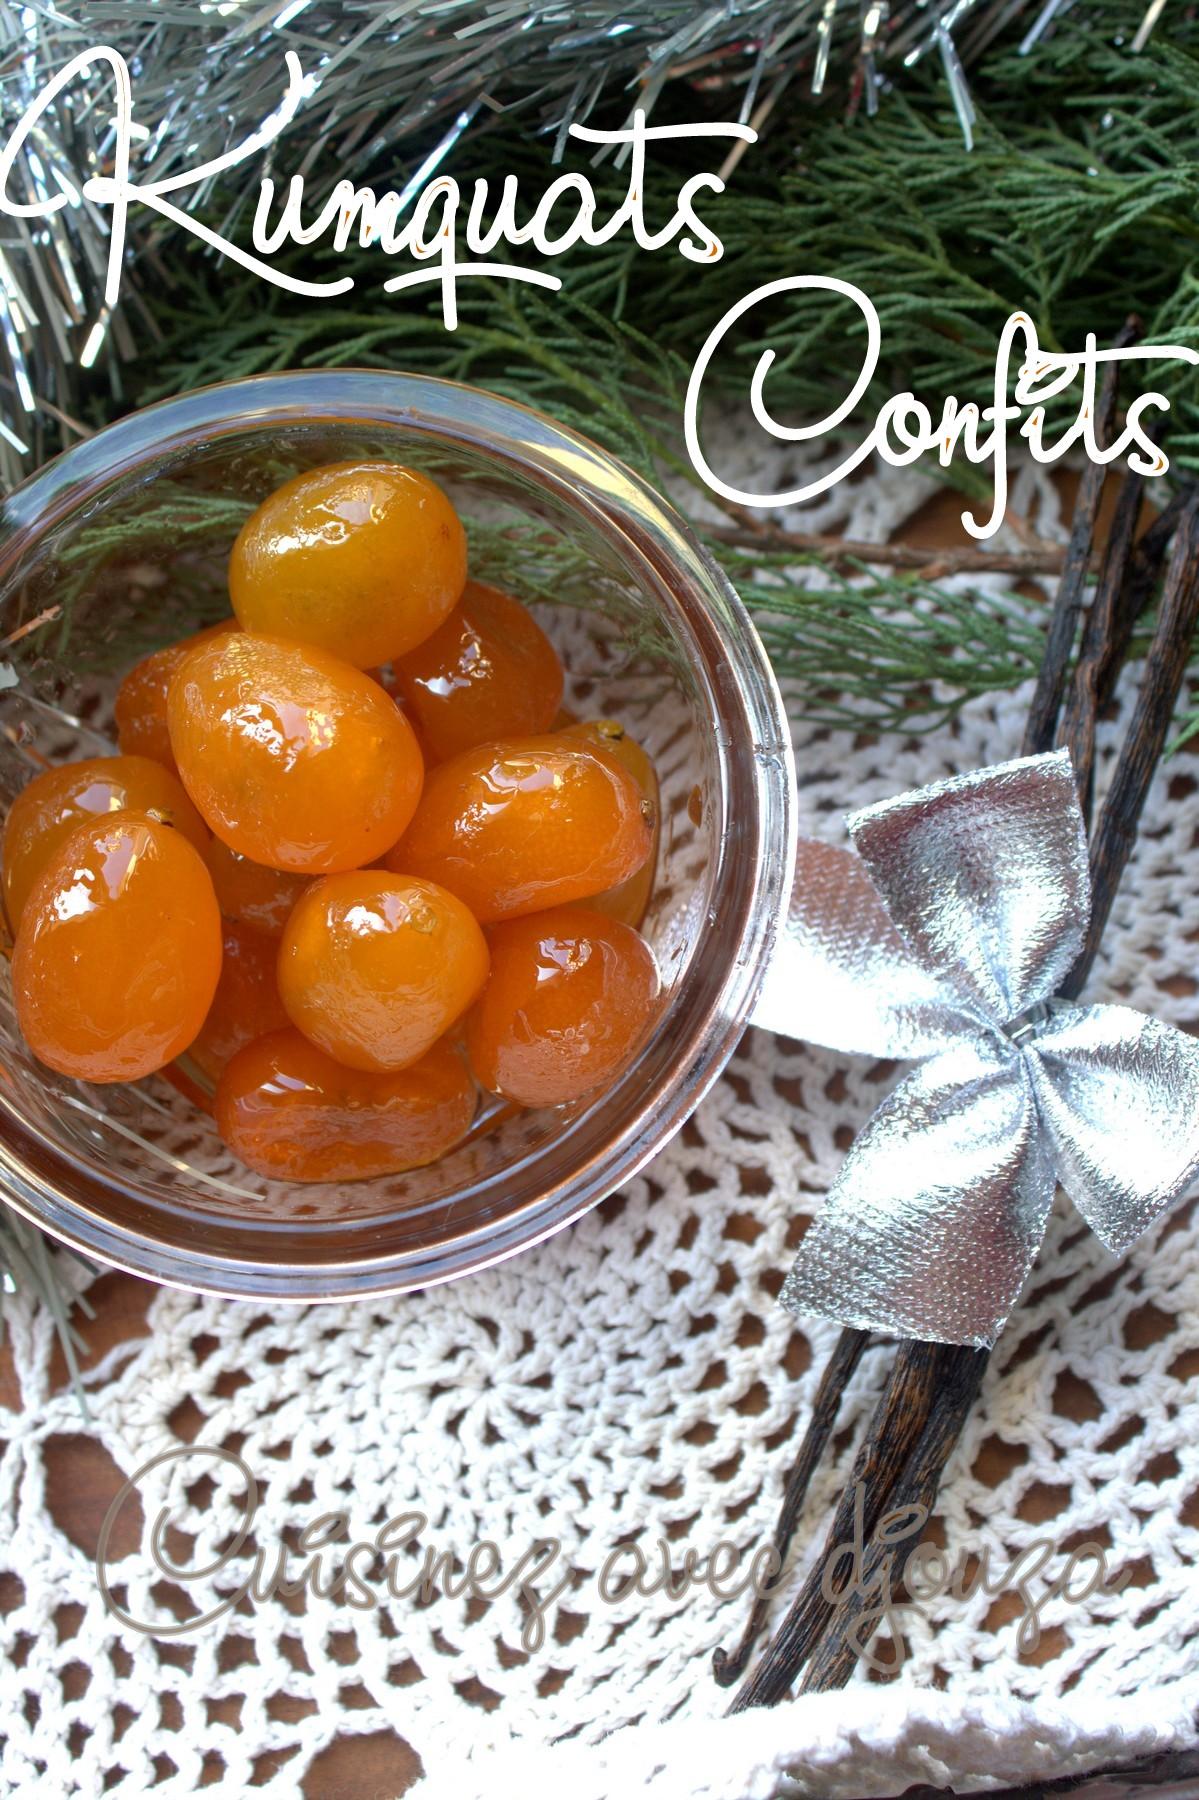 Kumquat confit maison